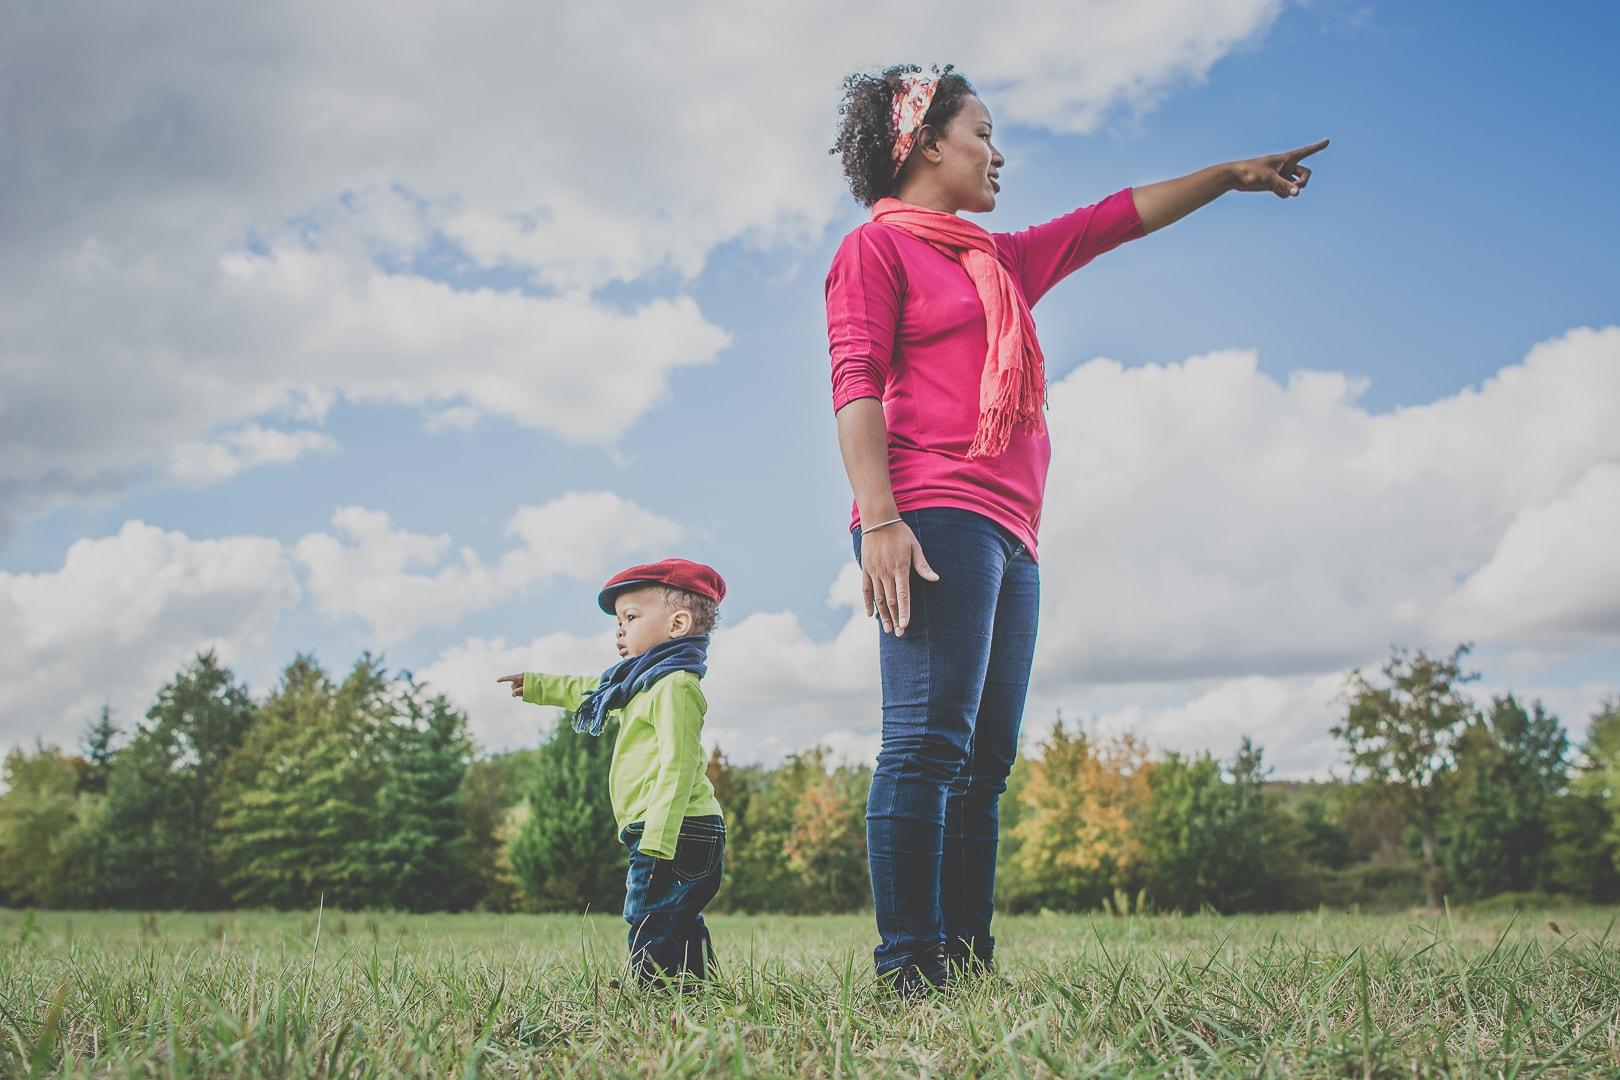 trezors-photography-photographe-professionnel-toulouse-31-enfance-seance-famille-lifestyle (7)